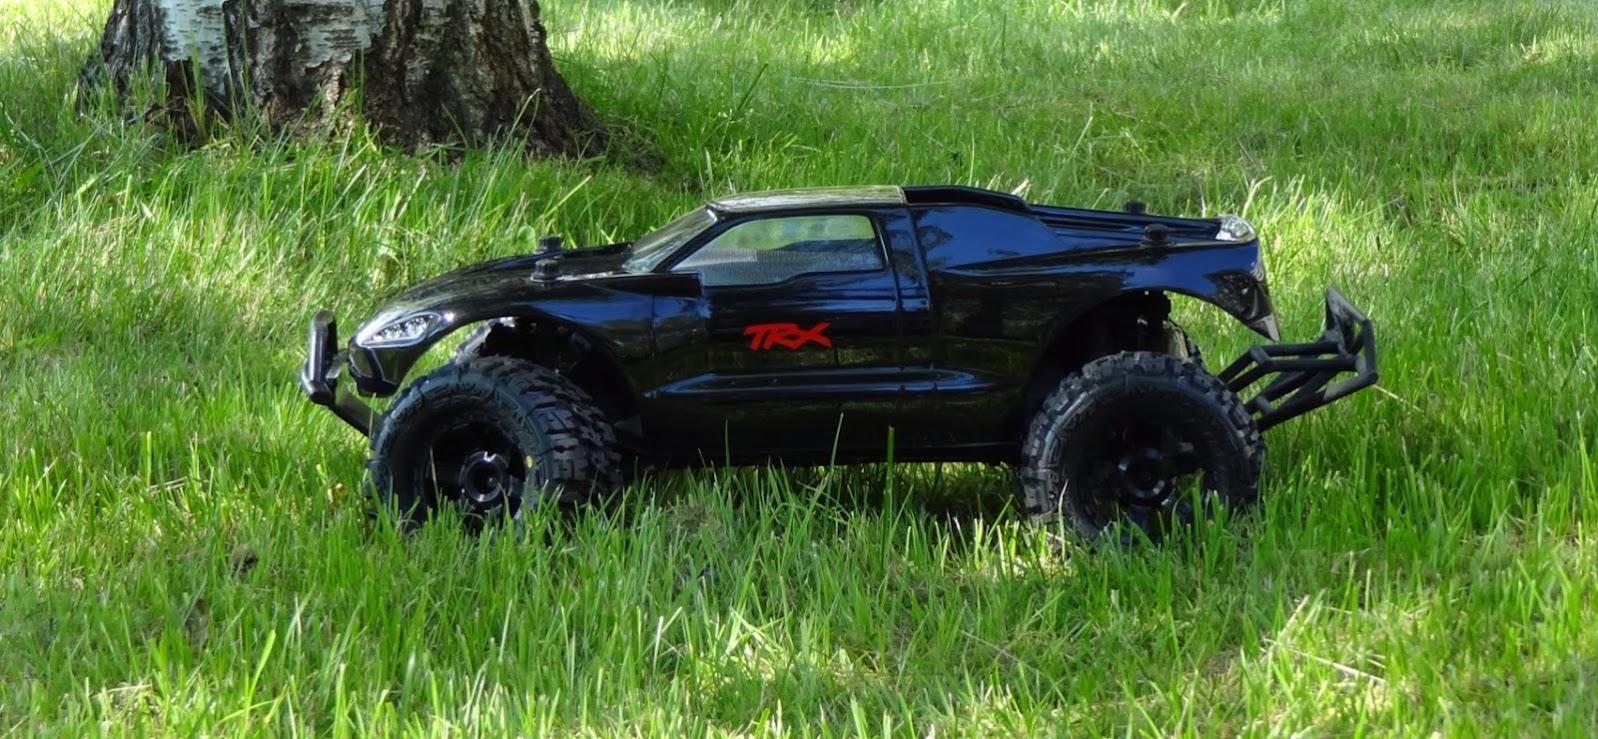 Projets : Slash 4WD MT + Slash 4WD GT Slash+4x4+2014-06-28+%25281%2529